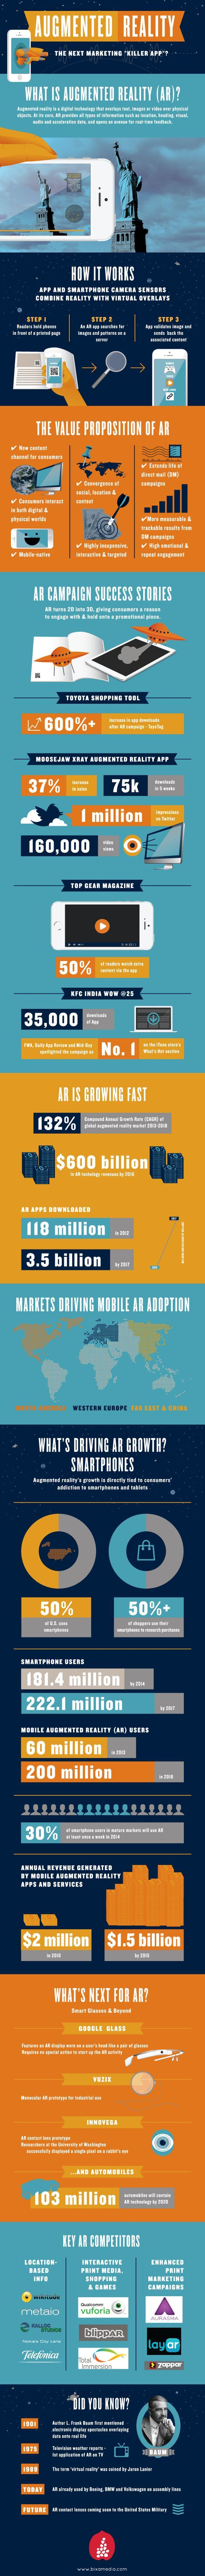 "Augmented Reality - The Next Marketing ""Killer App""? #infographic #DigitalMarketing #Business #App:"